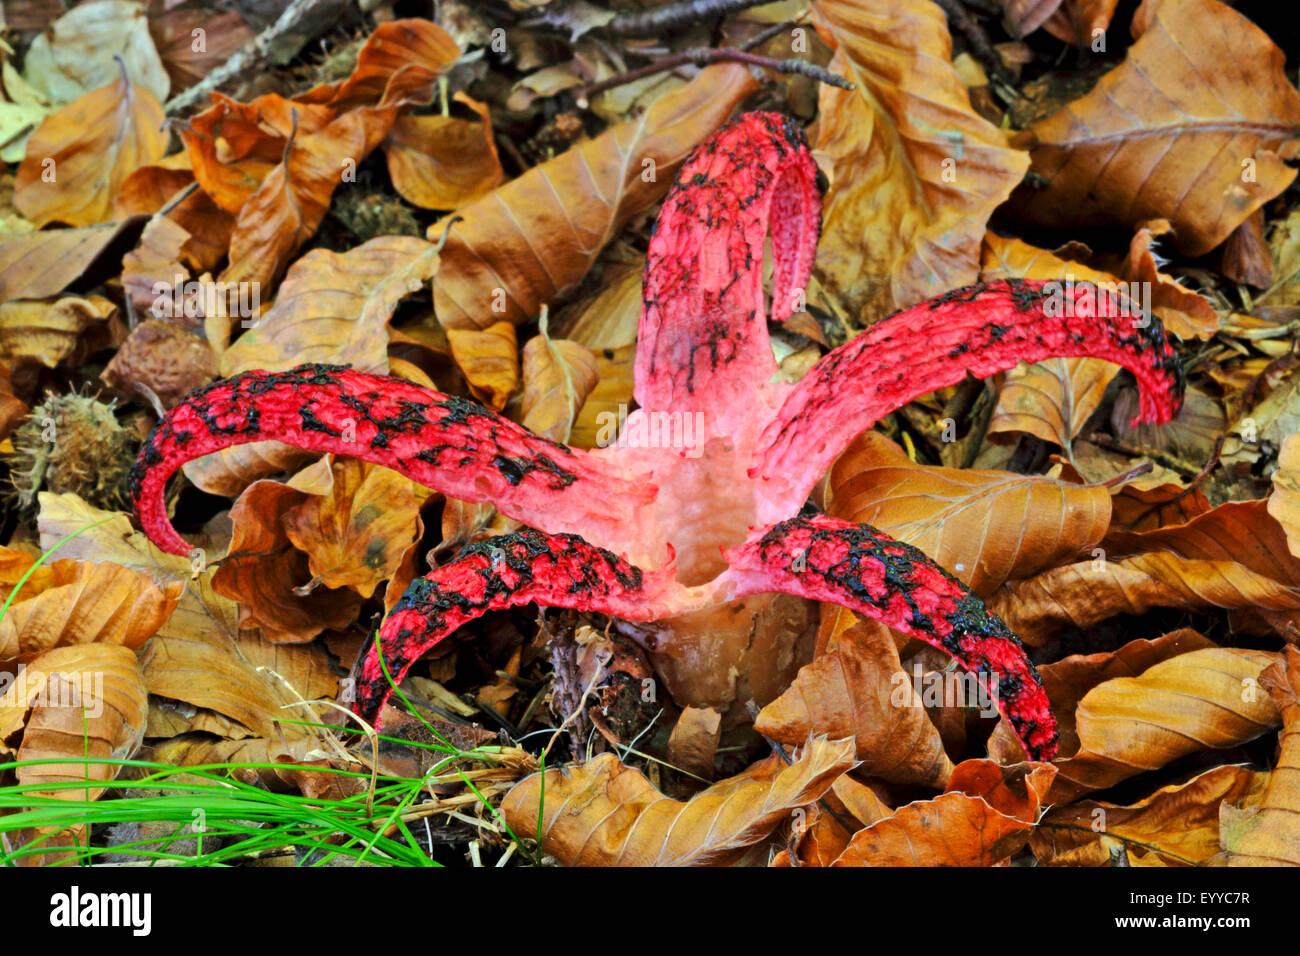 Teufels Finger, Teufels-Kralle-Pilz, Riesen Gestank Horn, Octopus Stinkmorchel (Anthurus Archeri, Clathrus Archeri), Stockbild